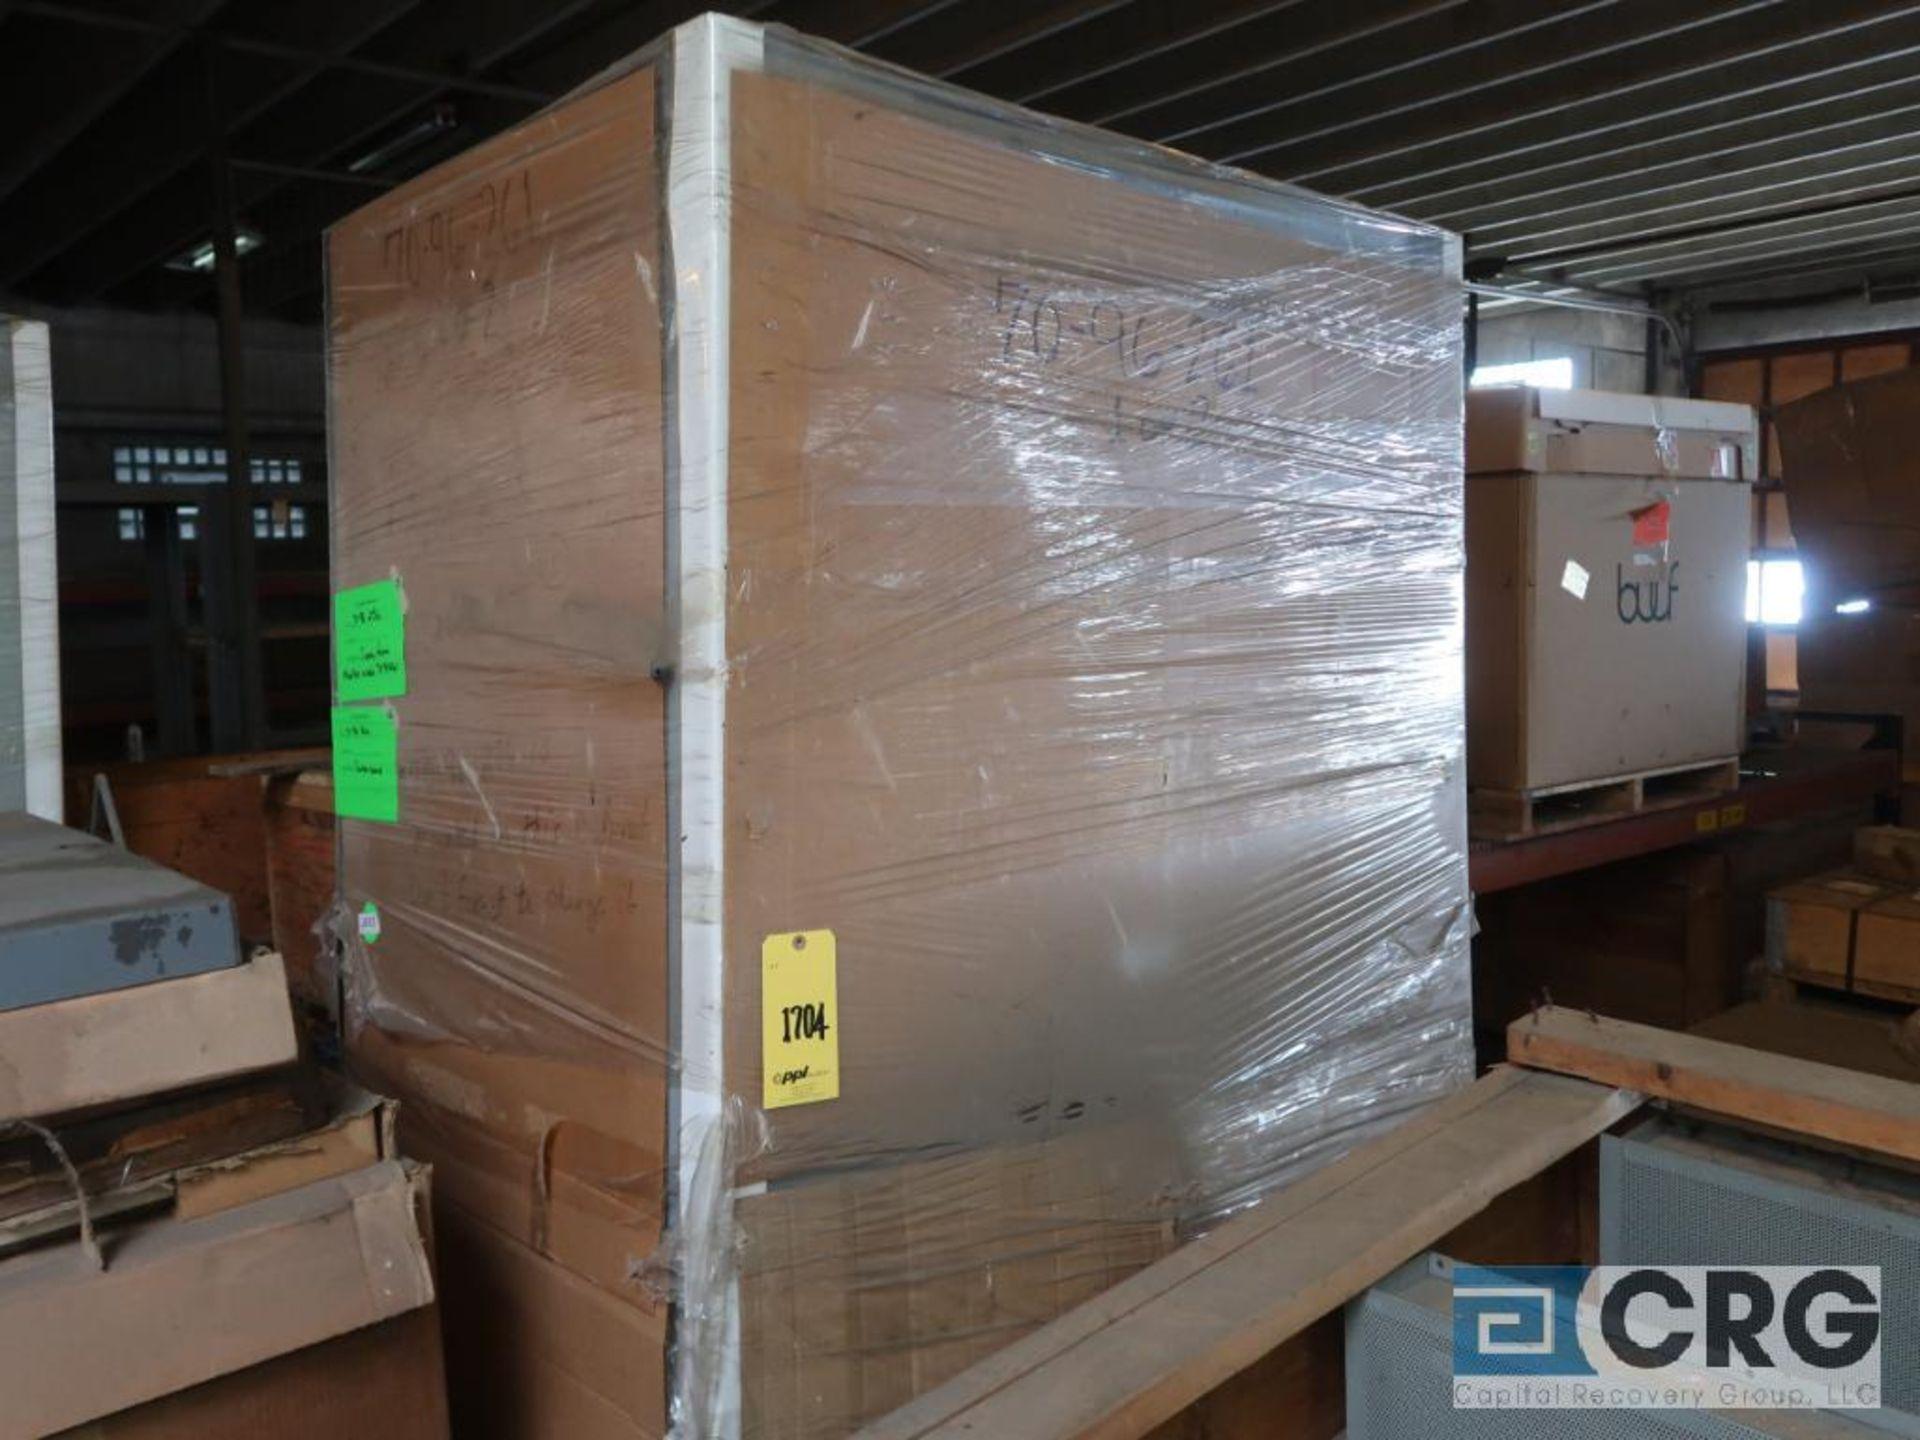 Uniclad 2000 KVA dry type transformer, 3 ph., HV 22860, BIL .125 KV, LV 480 GRDY/277 BIL. 10 KV, (5) - Image 4 of 4